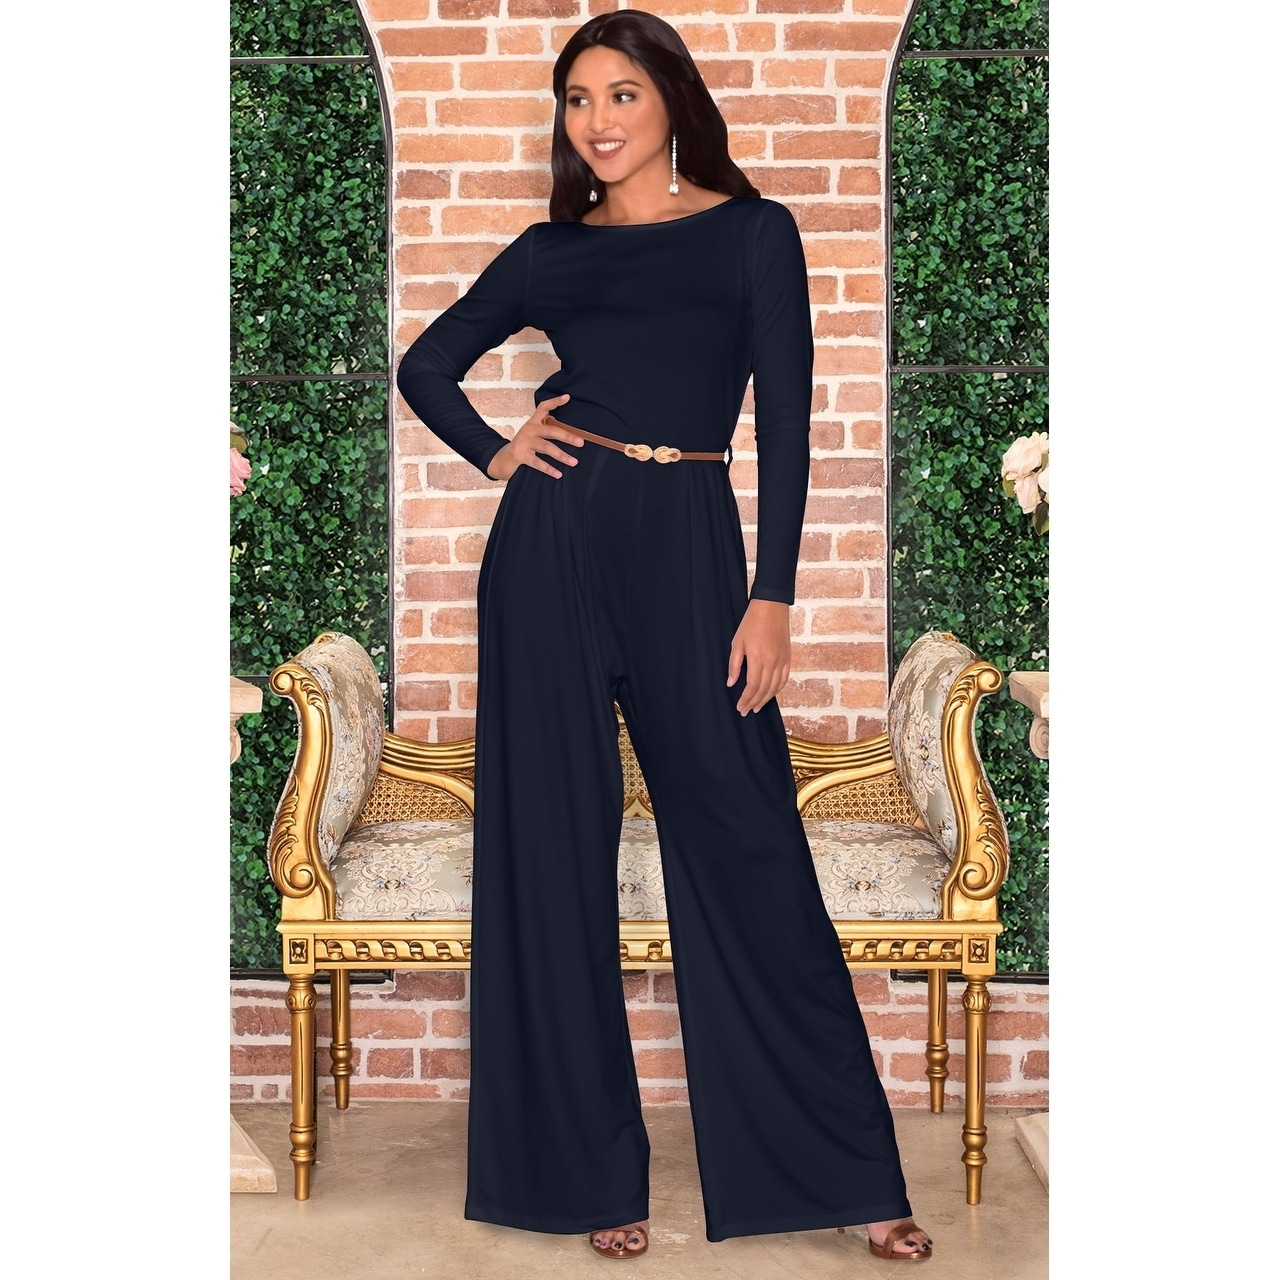 Shop Koh Koh Womens Round Neck Long Sleeve High Waist Romper